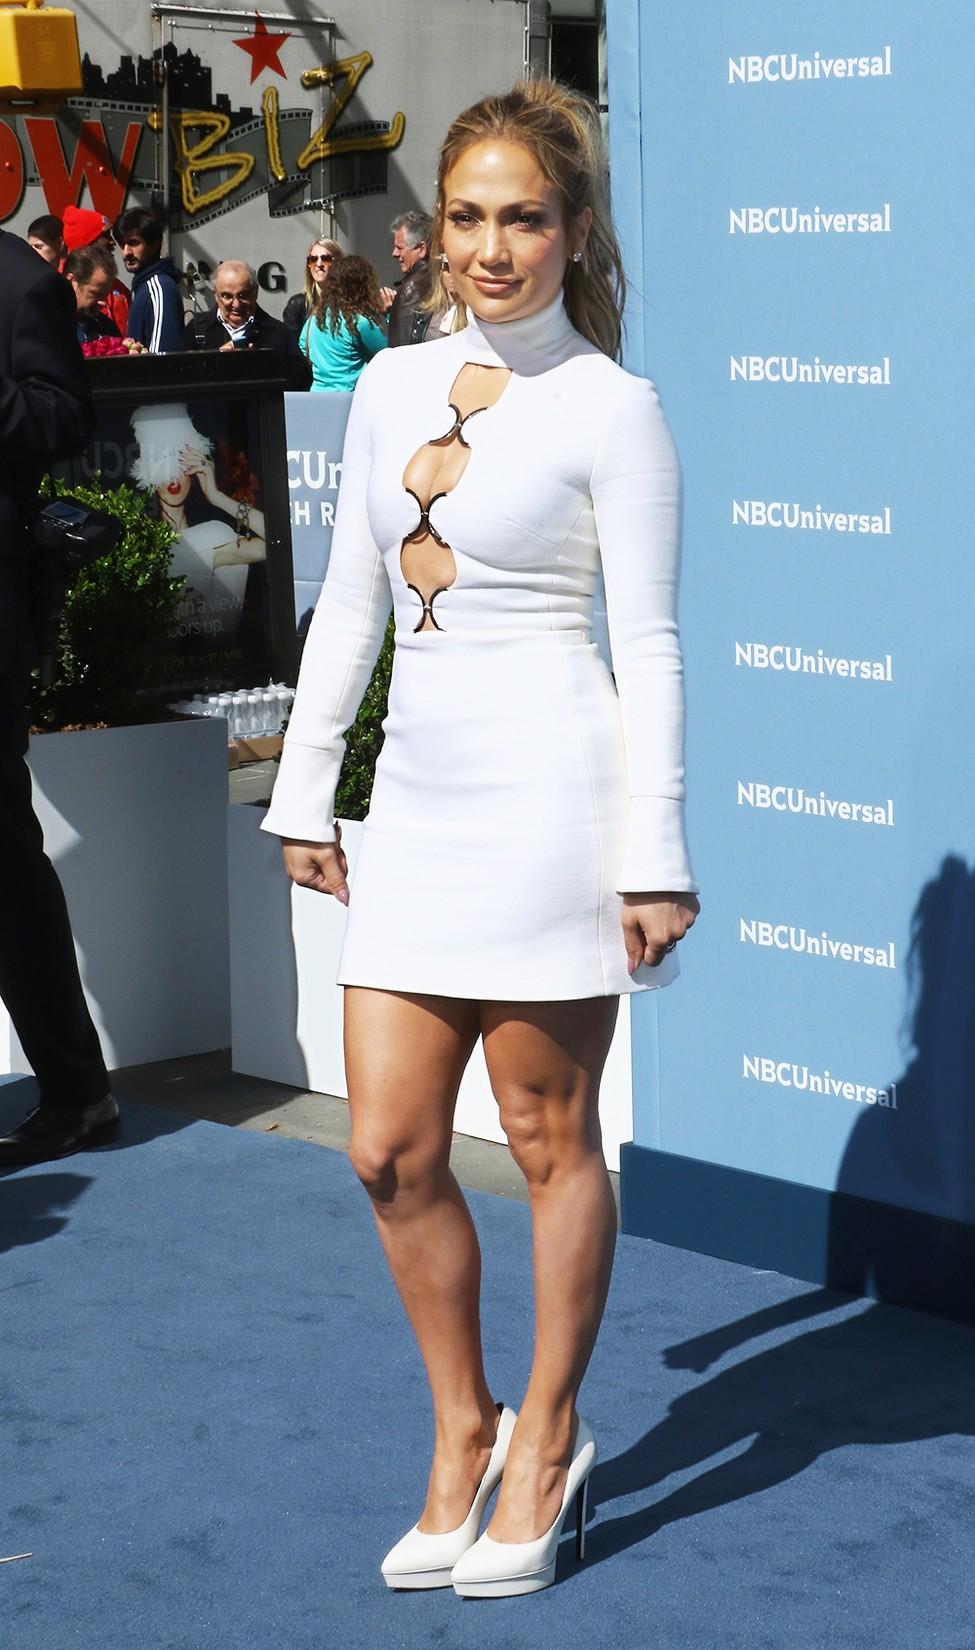 Jennifer Lopez attends the 2016 NBCUniversal Upfront